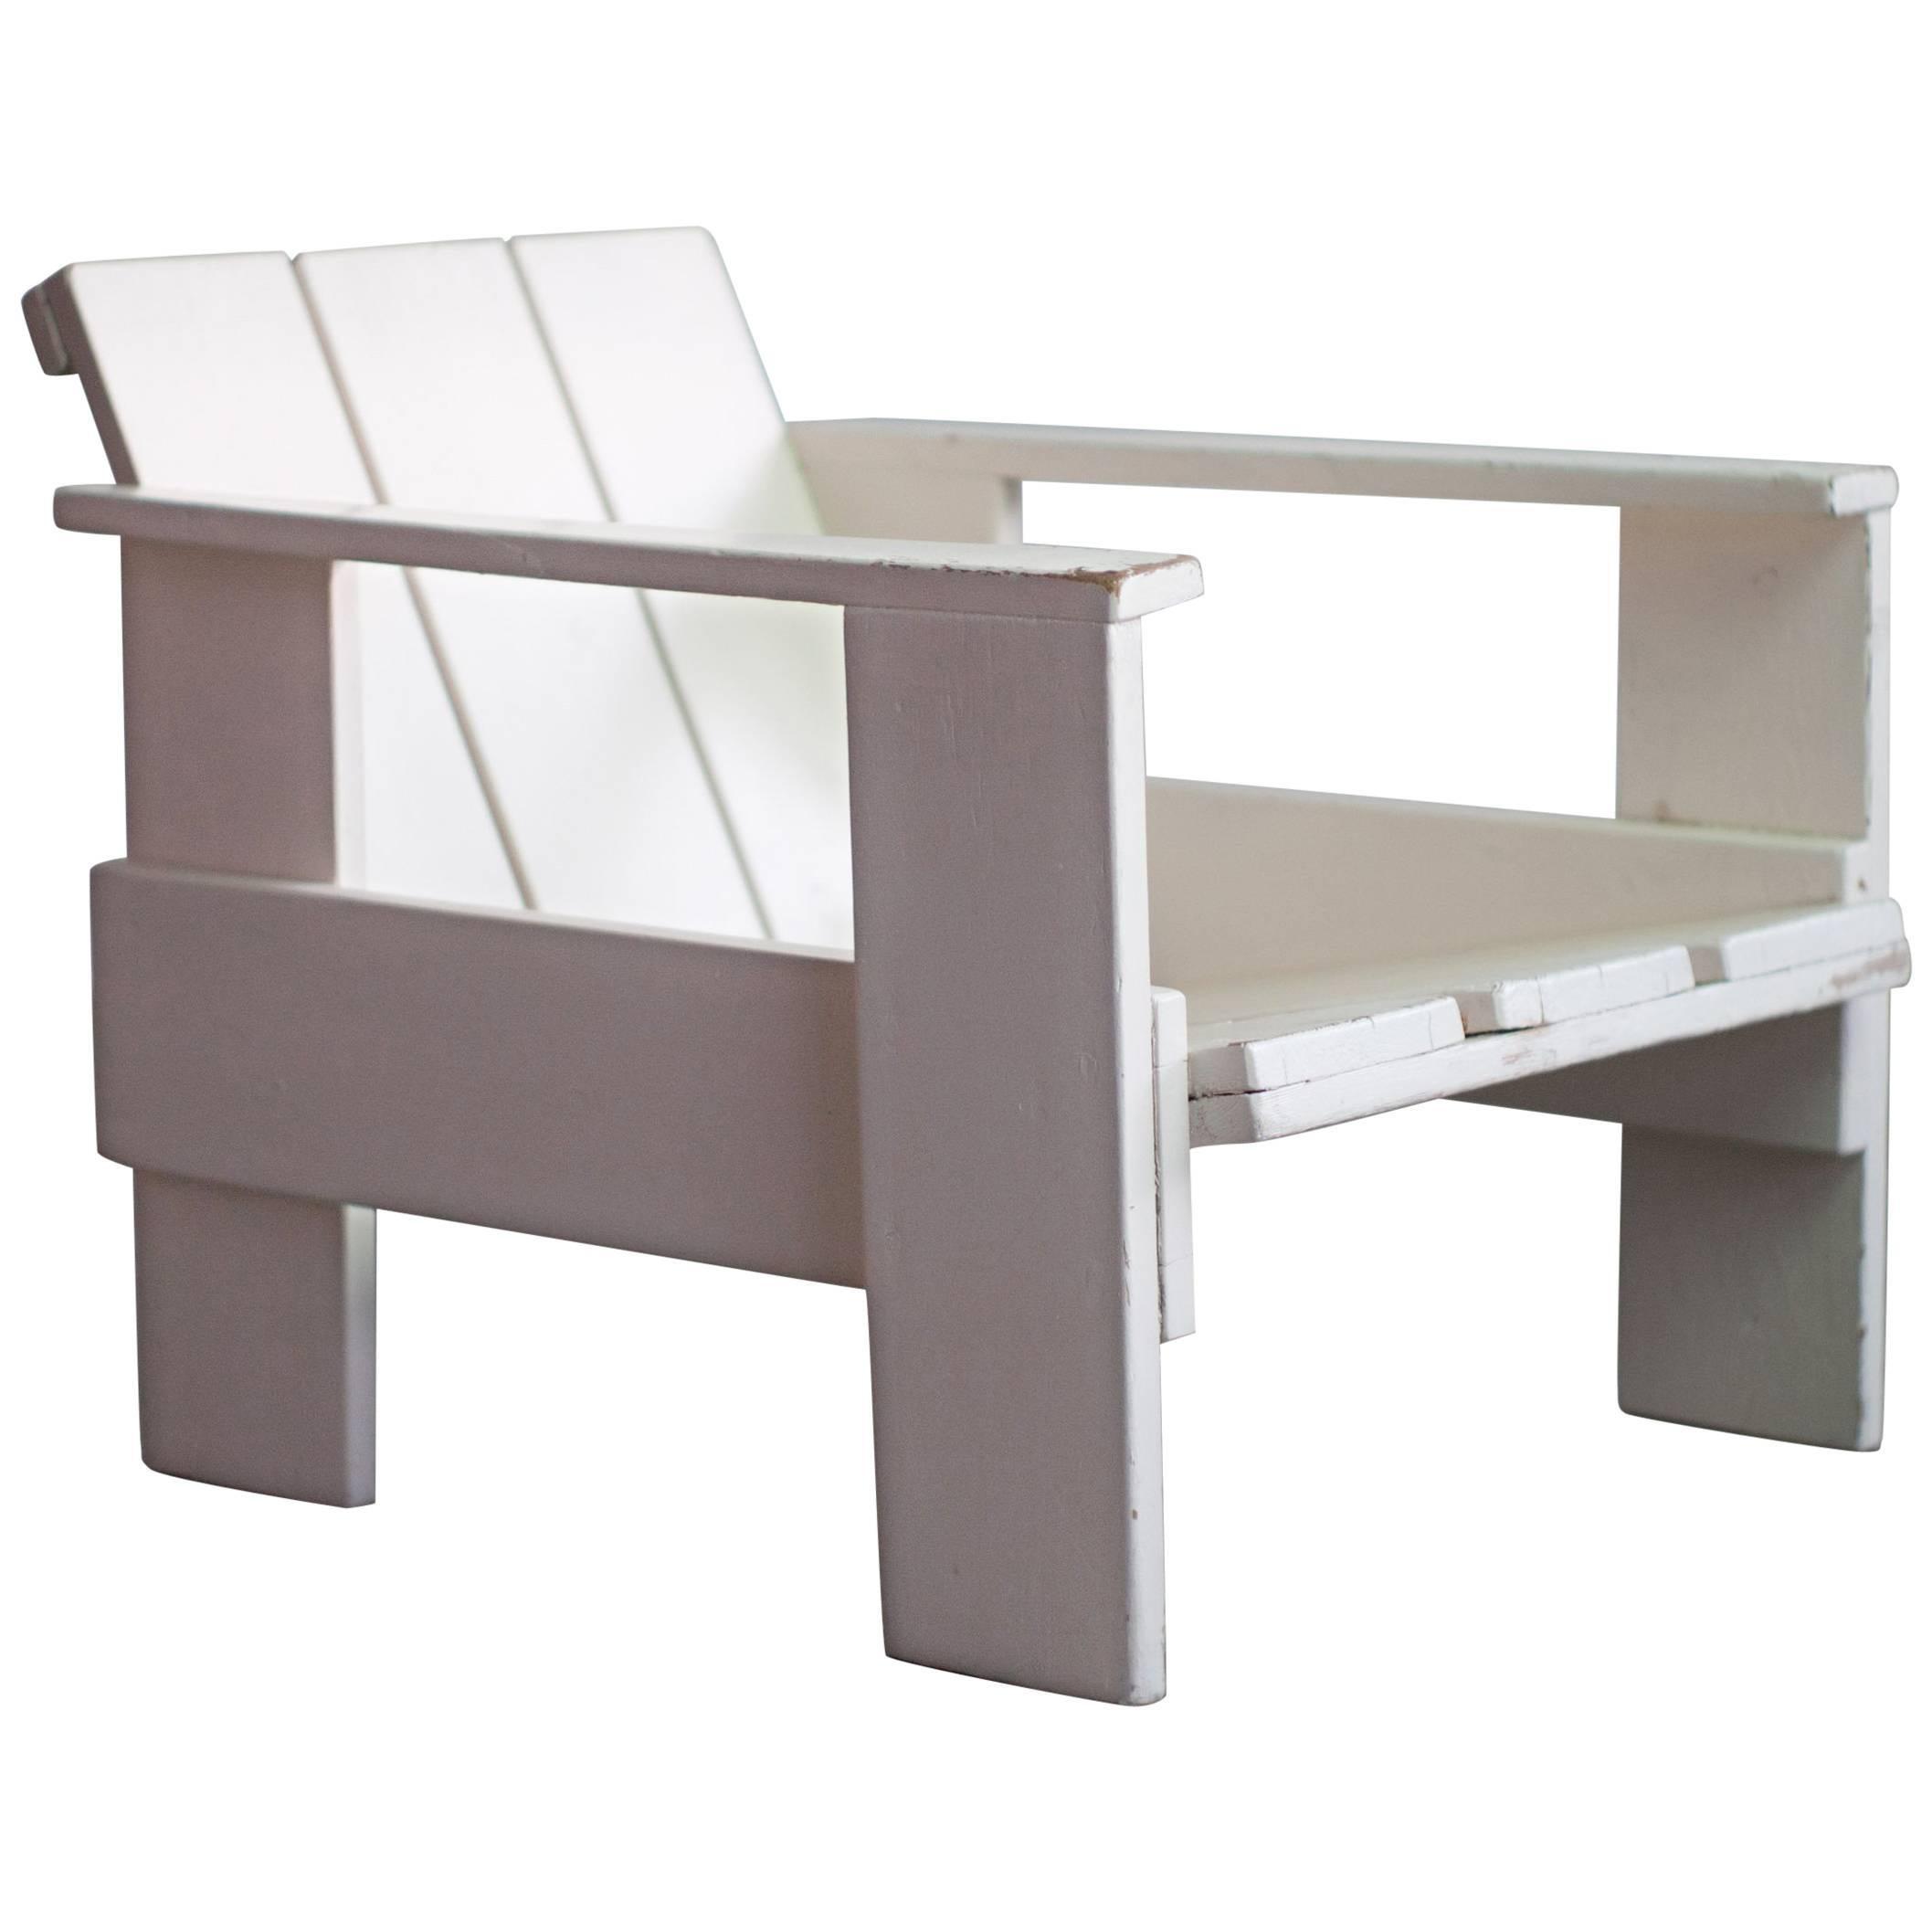 Superieur Gerrit Rietveld Prewar Crate Chair For Metz U0026 Co, 1934 For Sale